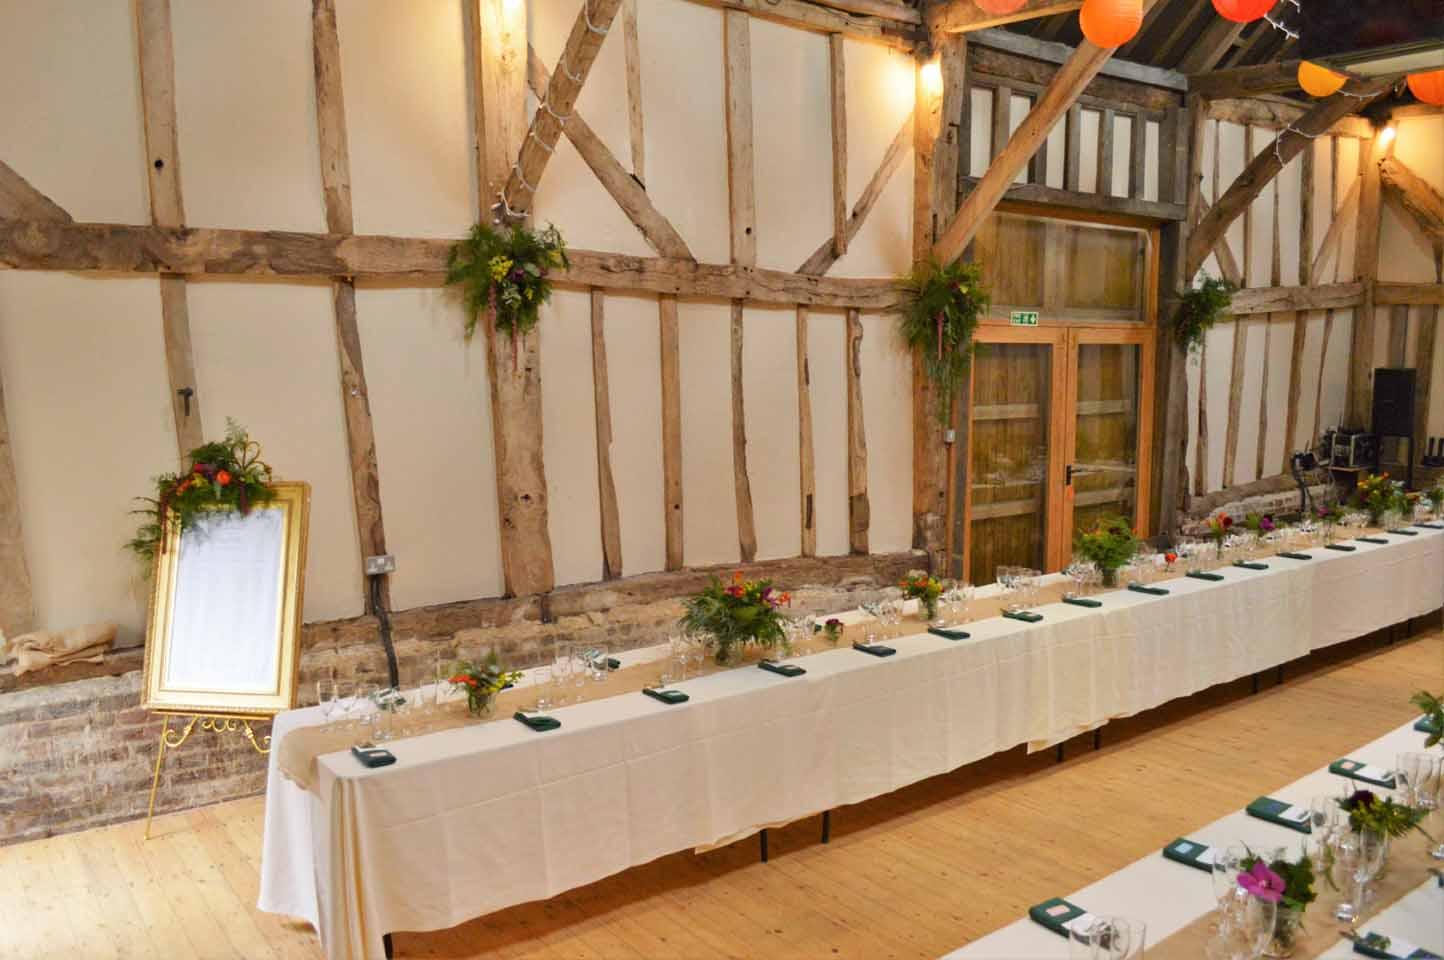 patricks barn wedding set up banquet table